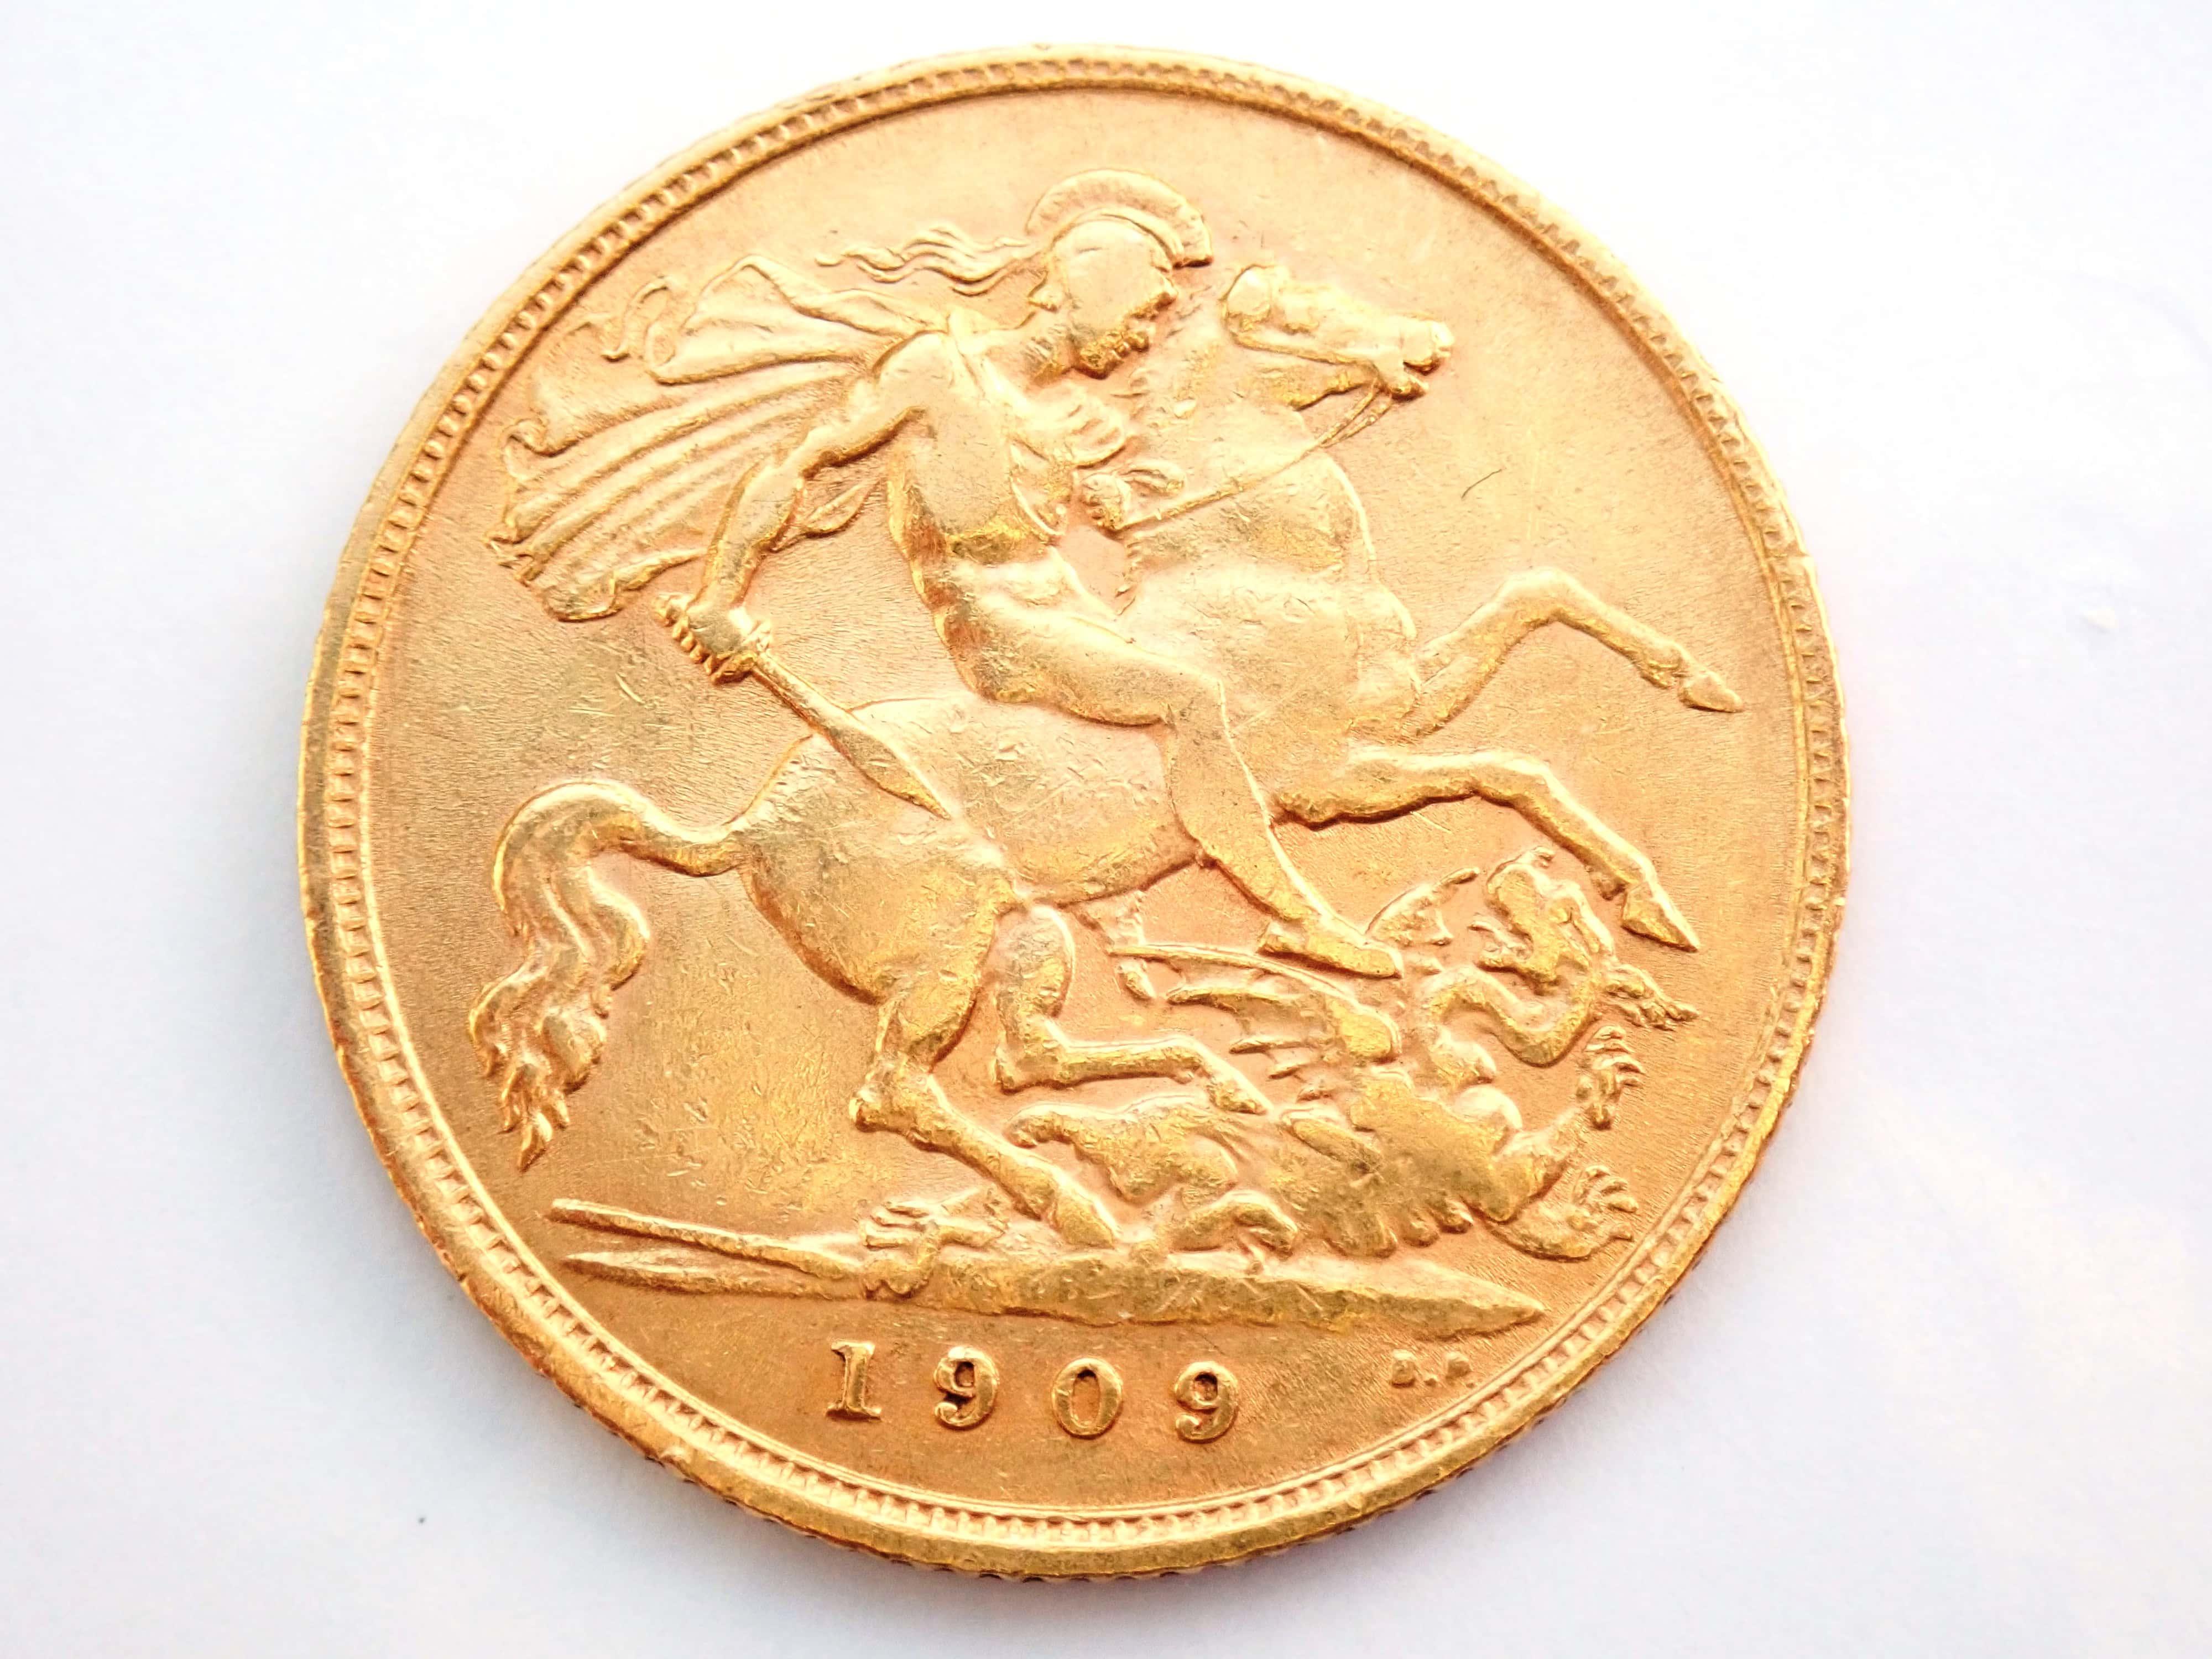 AA000818 - 1909 22ct Gold Half Sovereign King Edward VII Coin London Mint A.U #195